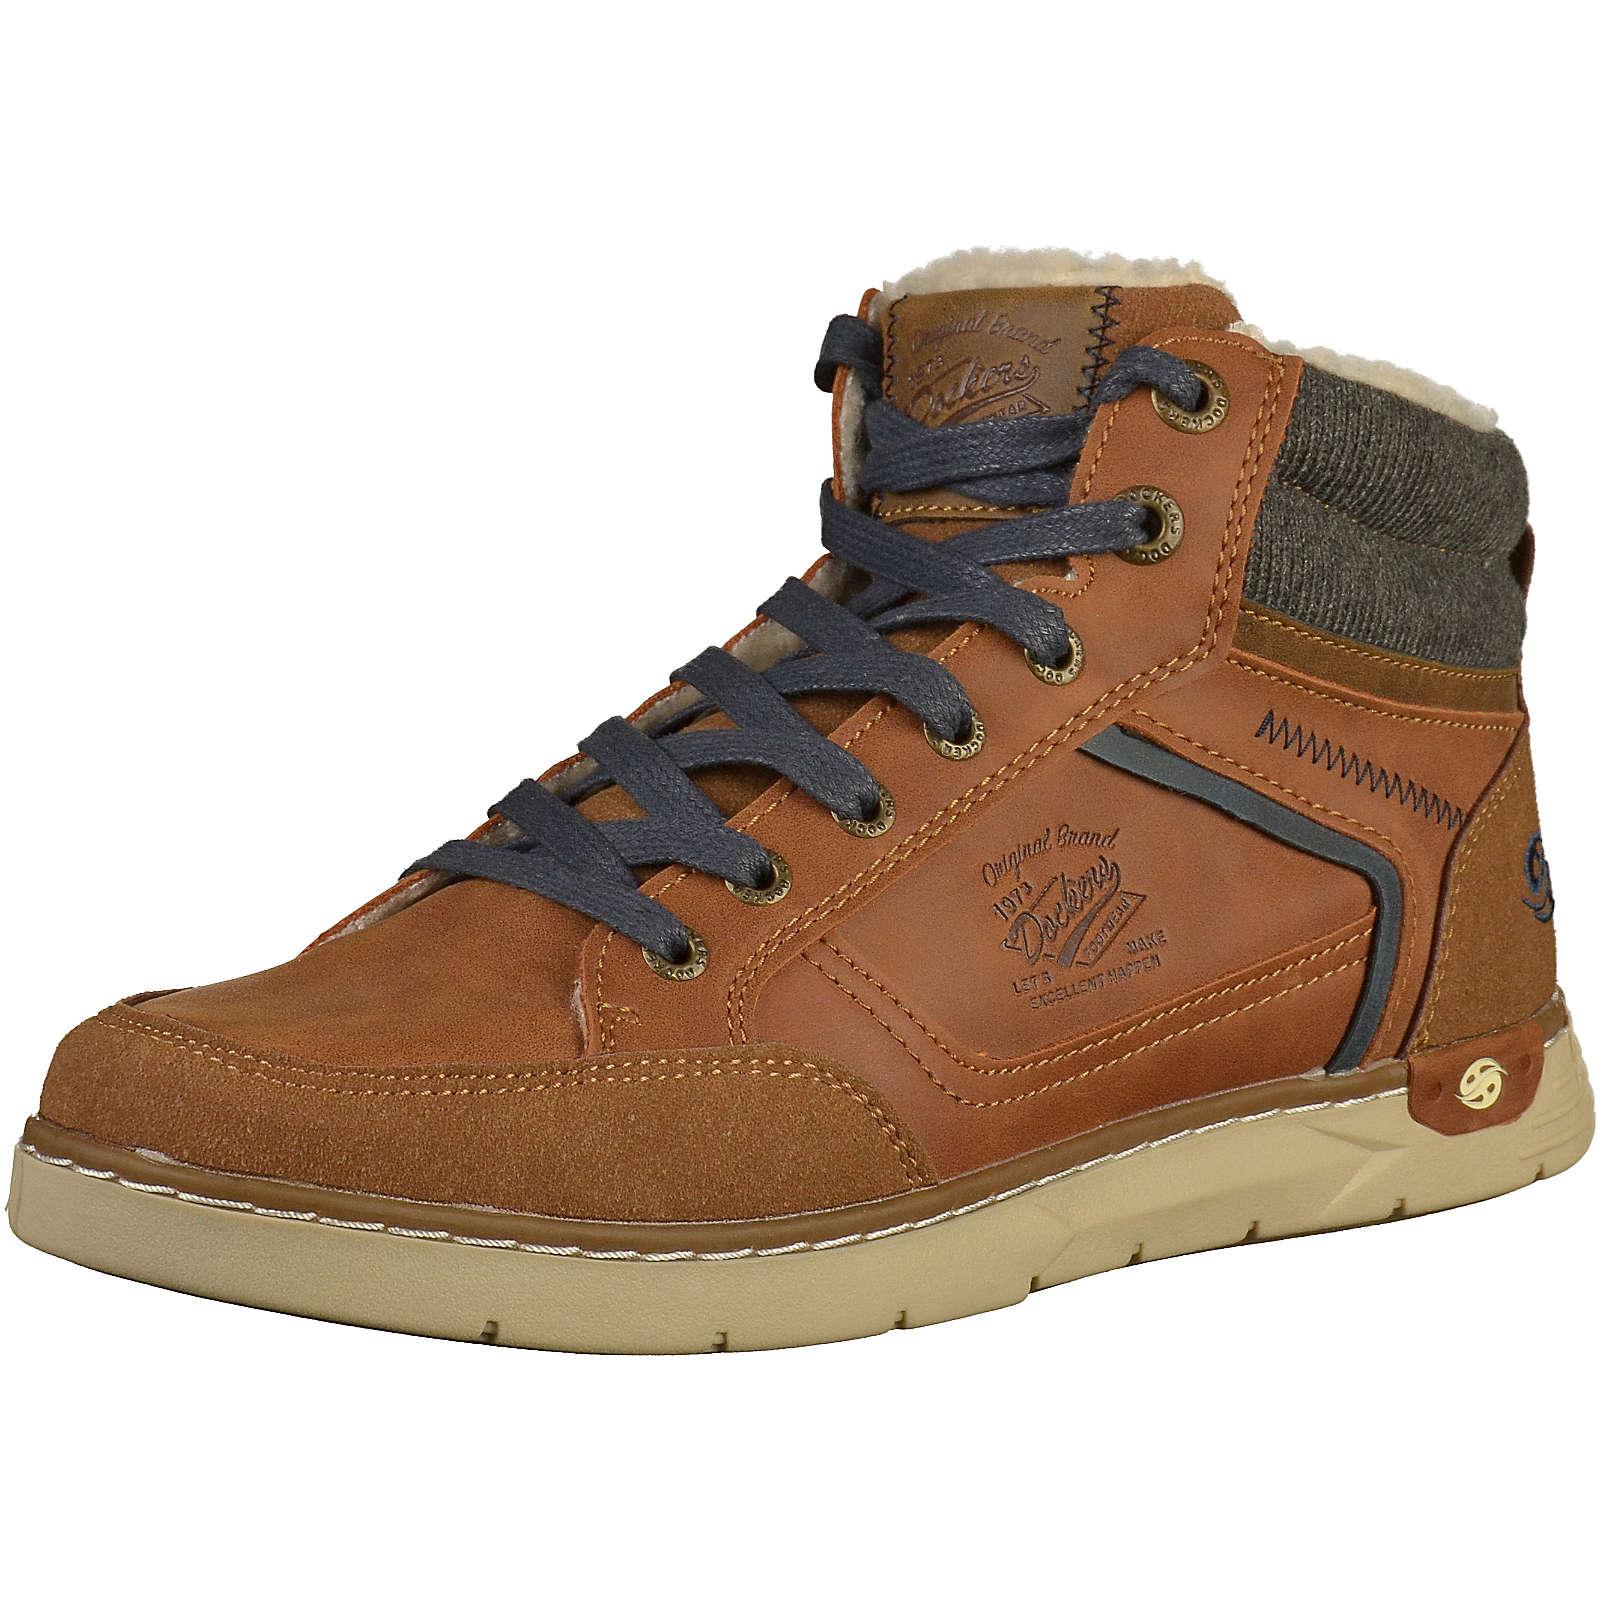 Dockers by Gerli Sneaker Sneakers High cognac Herren Gr. 46